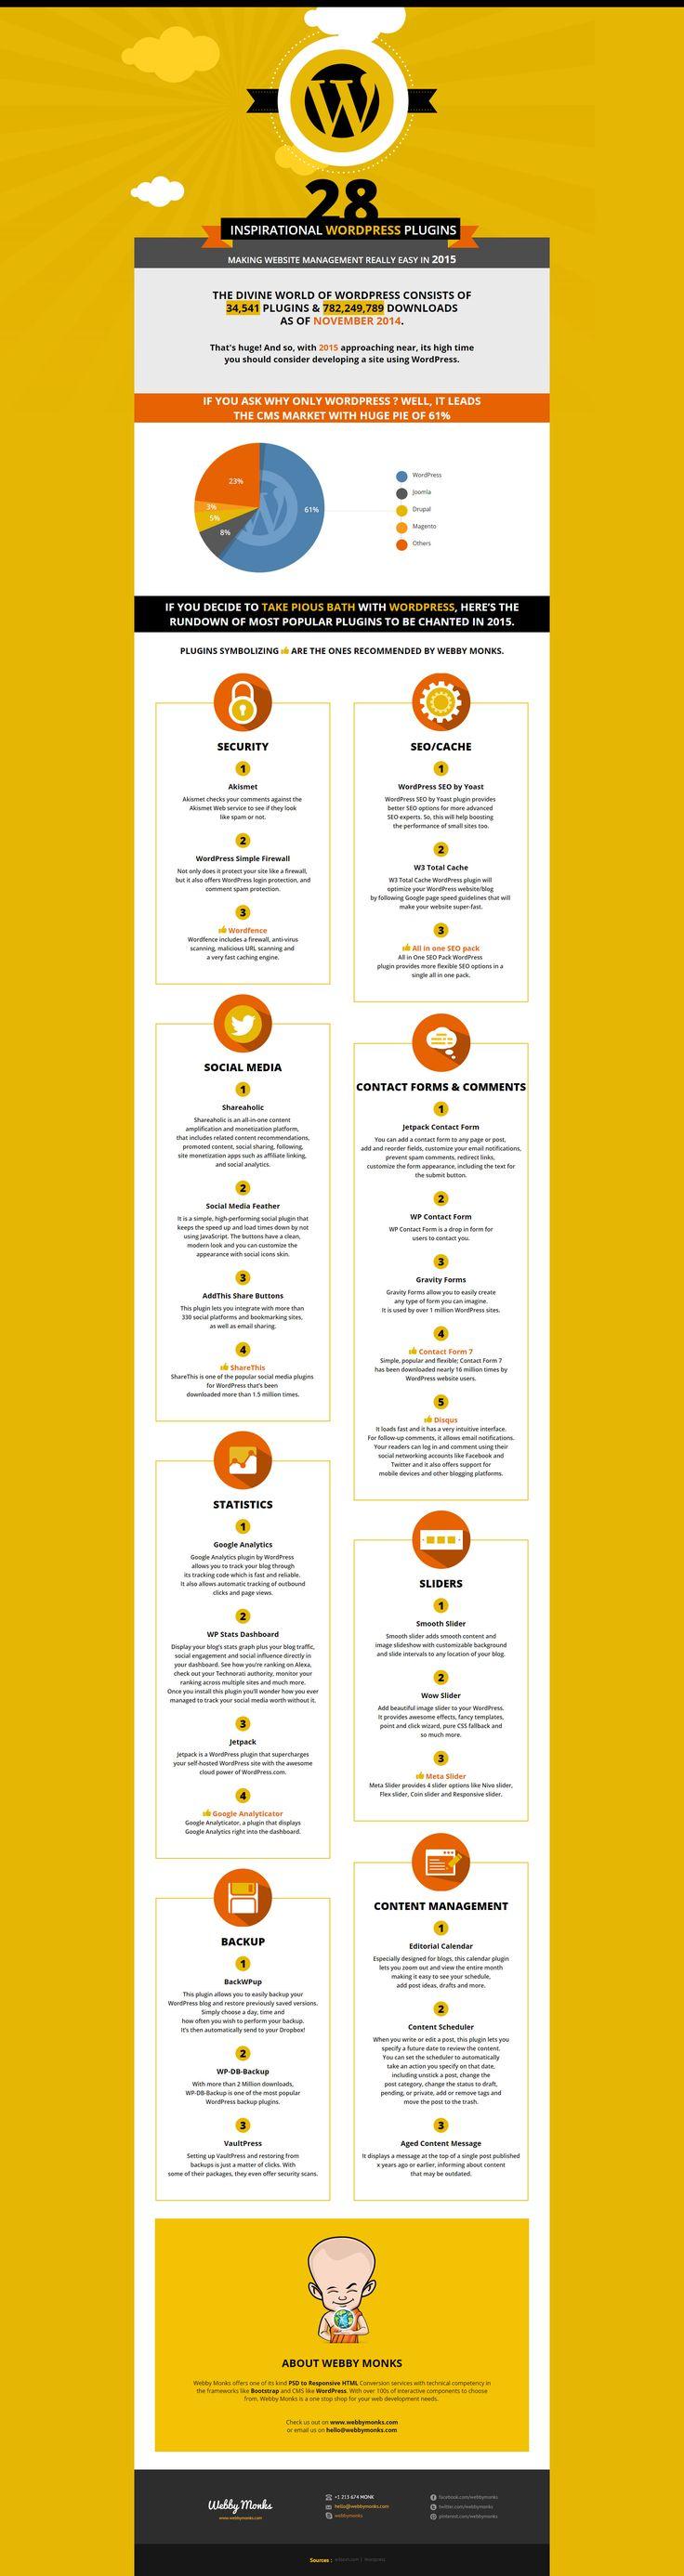 wordpress plugin Wordpress plugins, Infographic, Wordpress